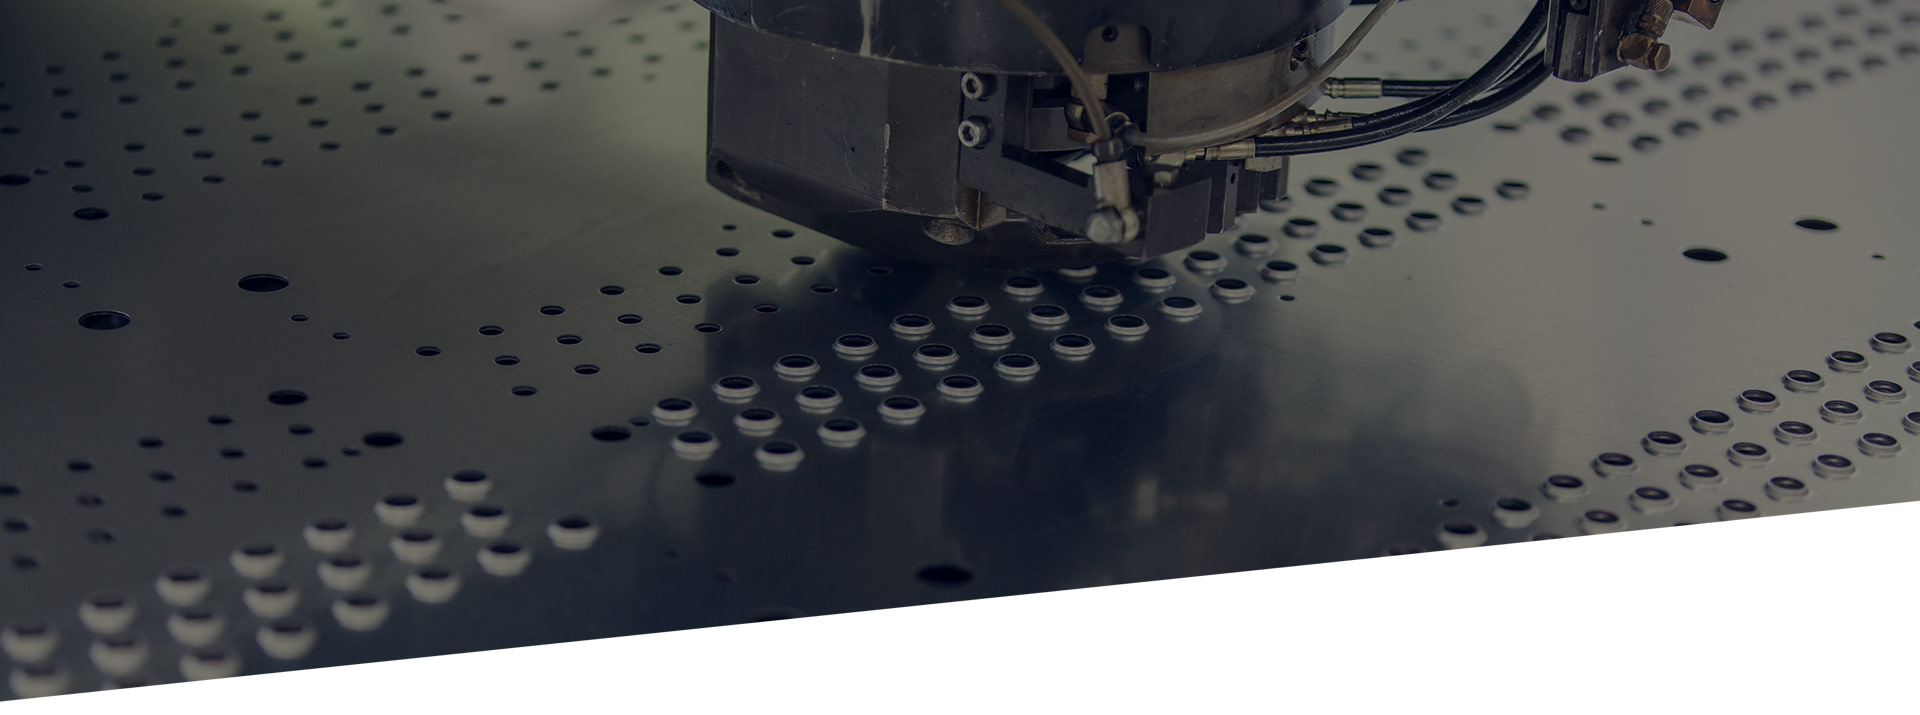 Punzonado CNC